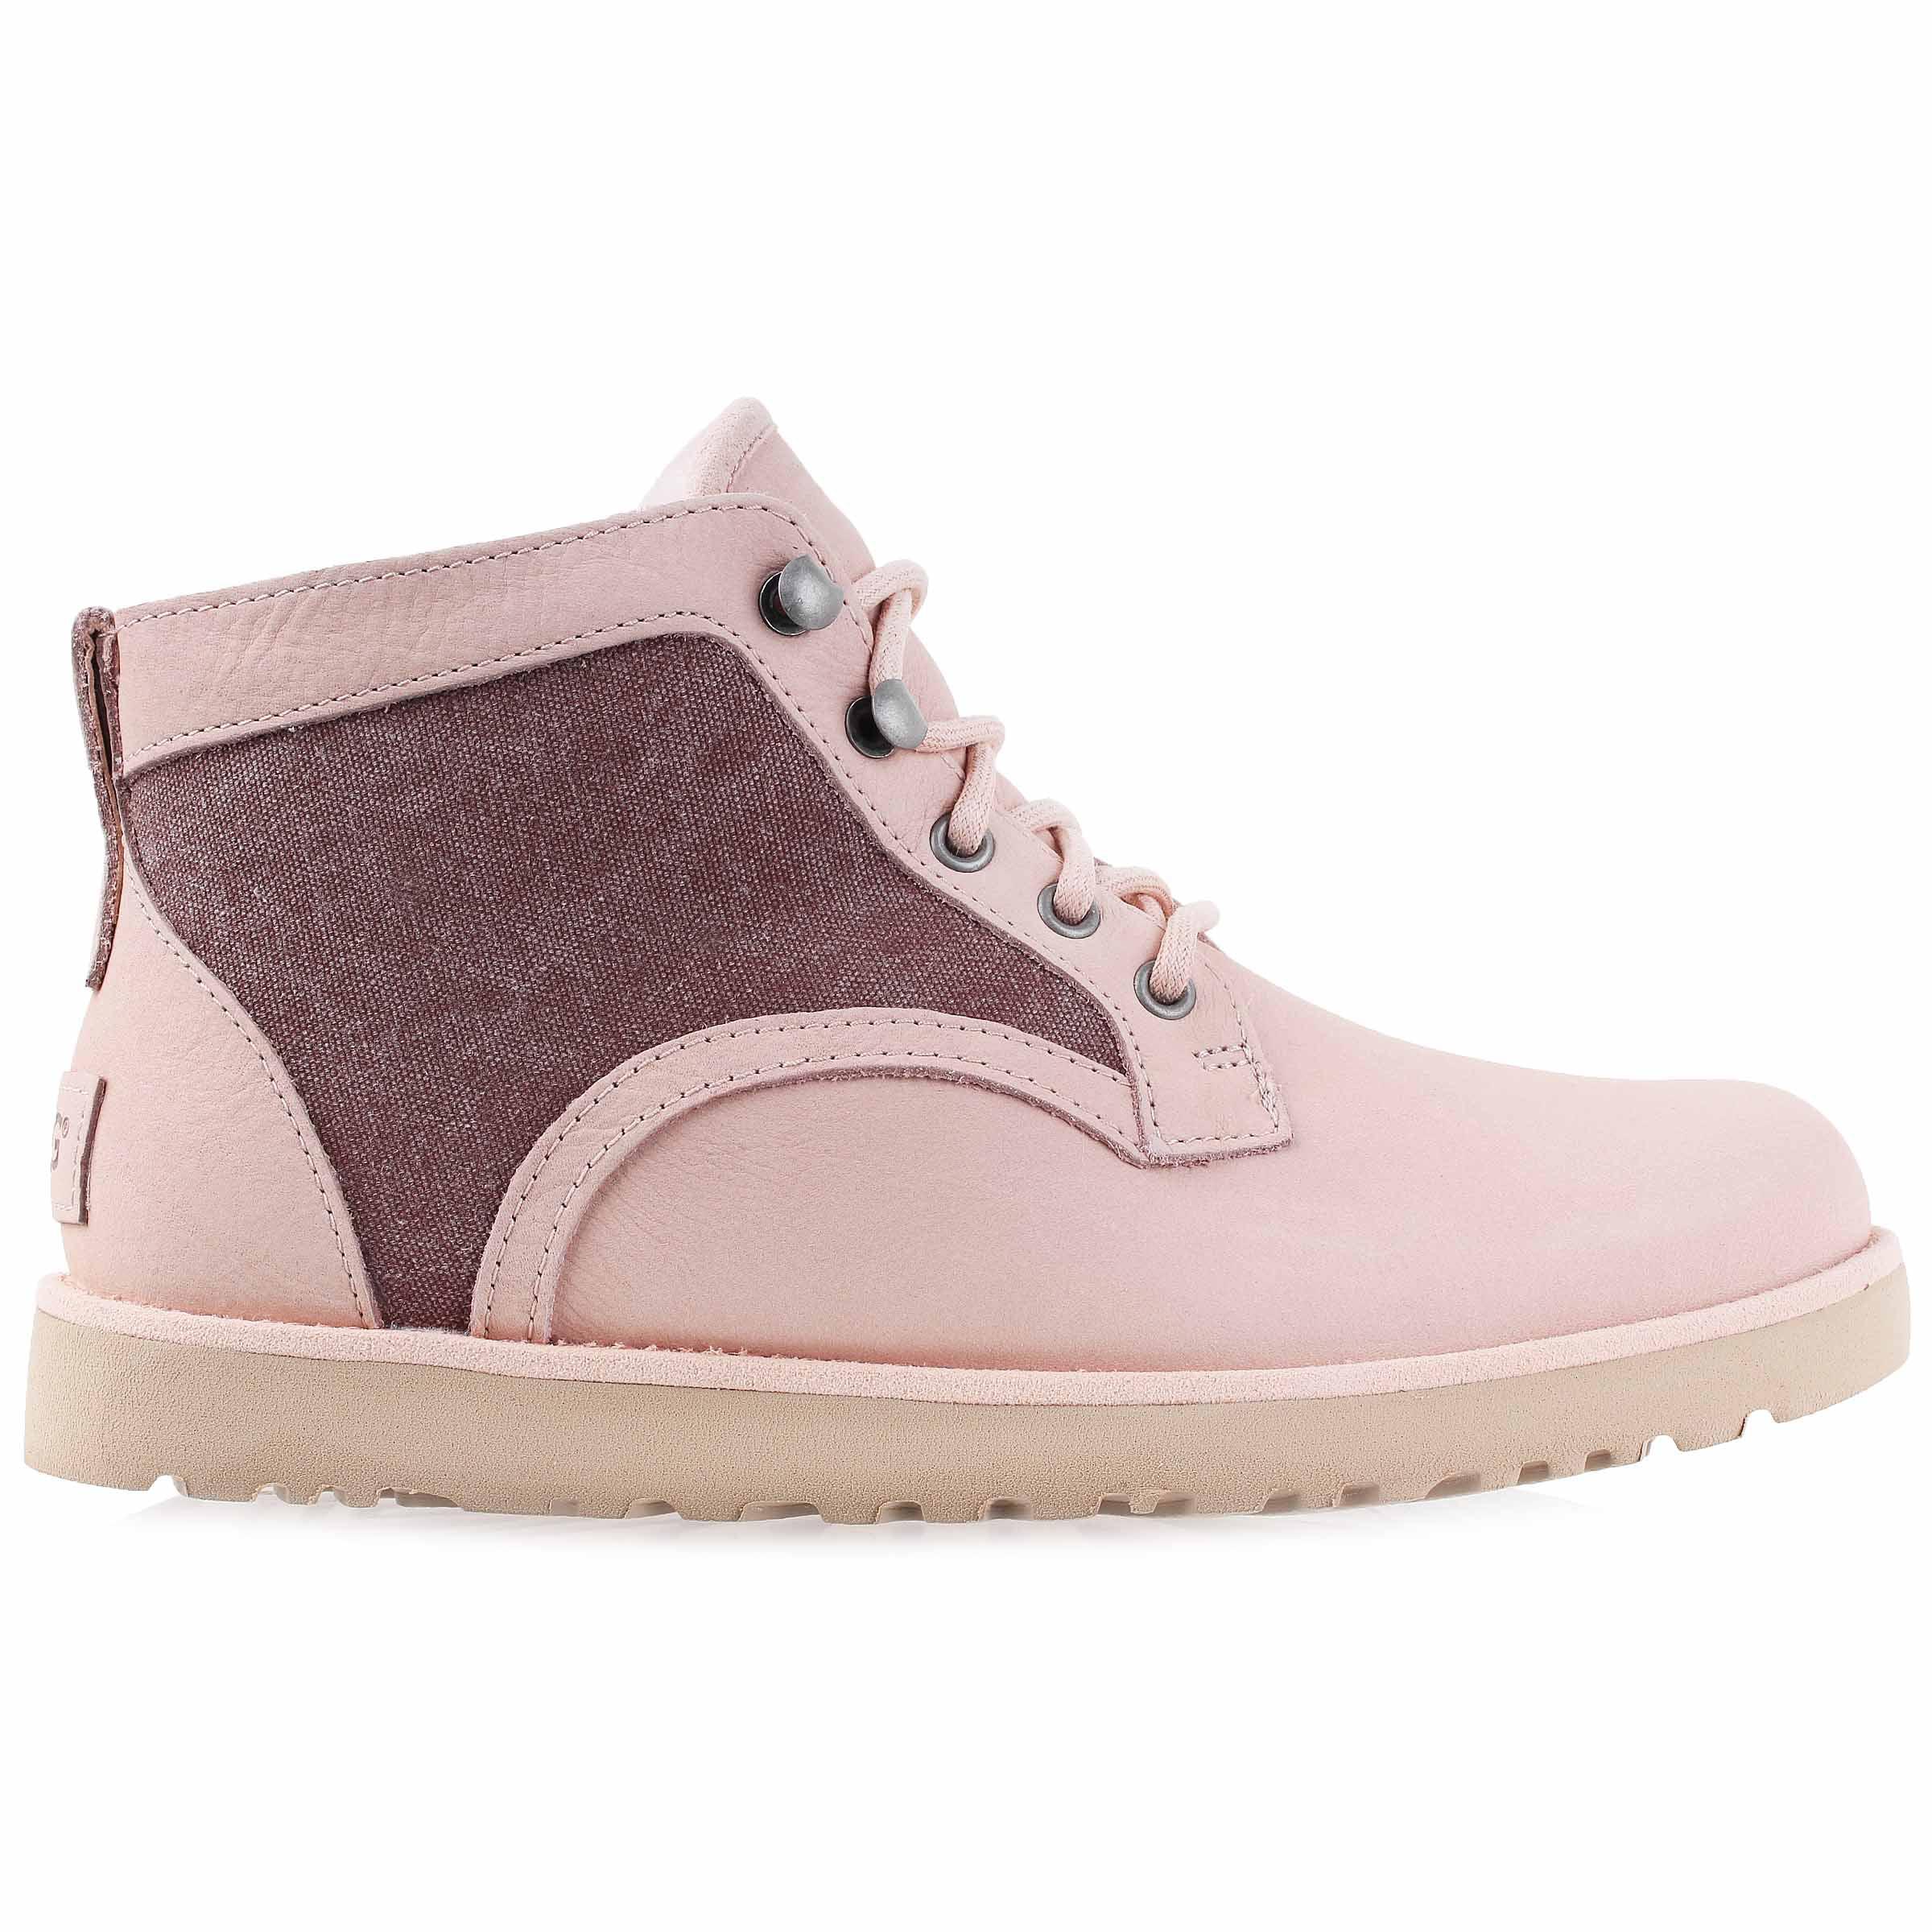 Drew Womens Bethany Fashion Sneakers